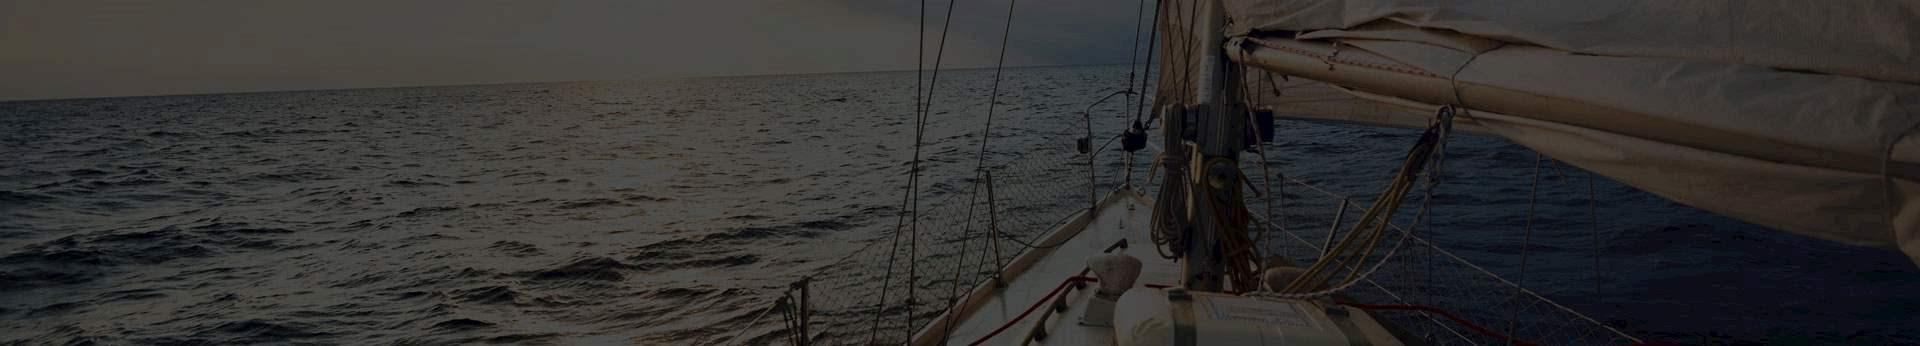 Newport, Rhode Island Sailing